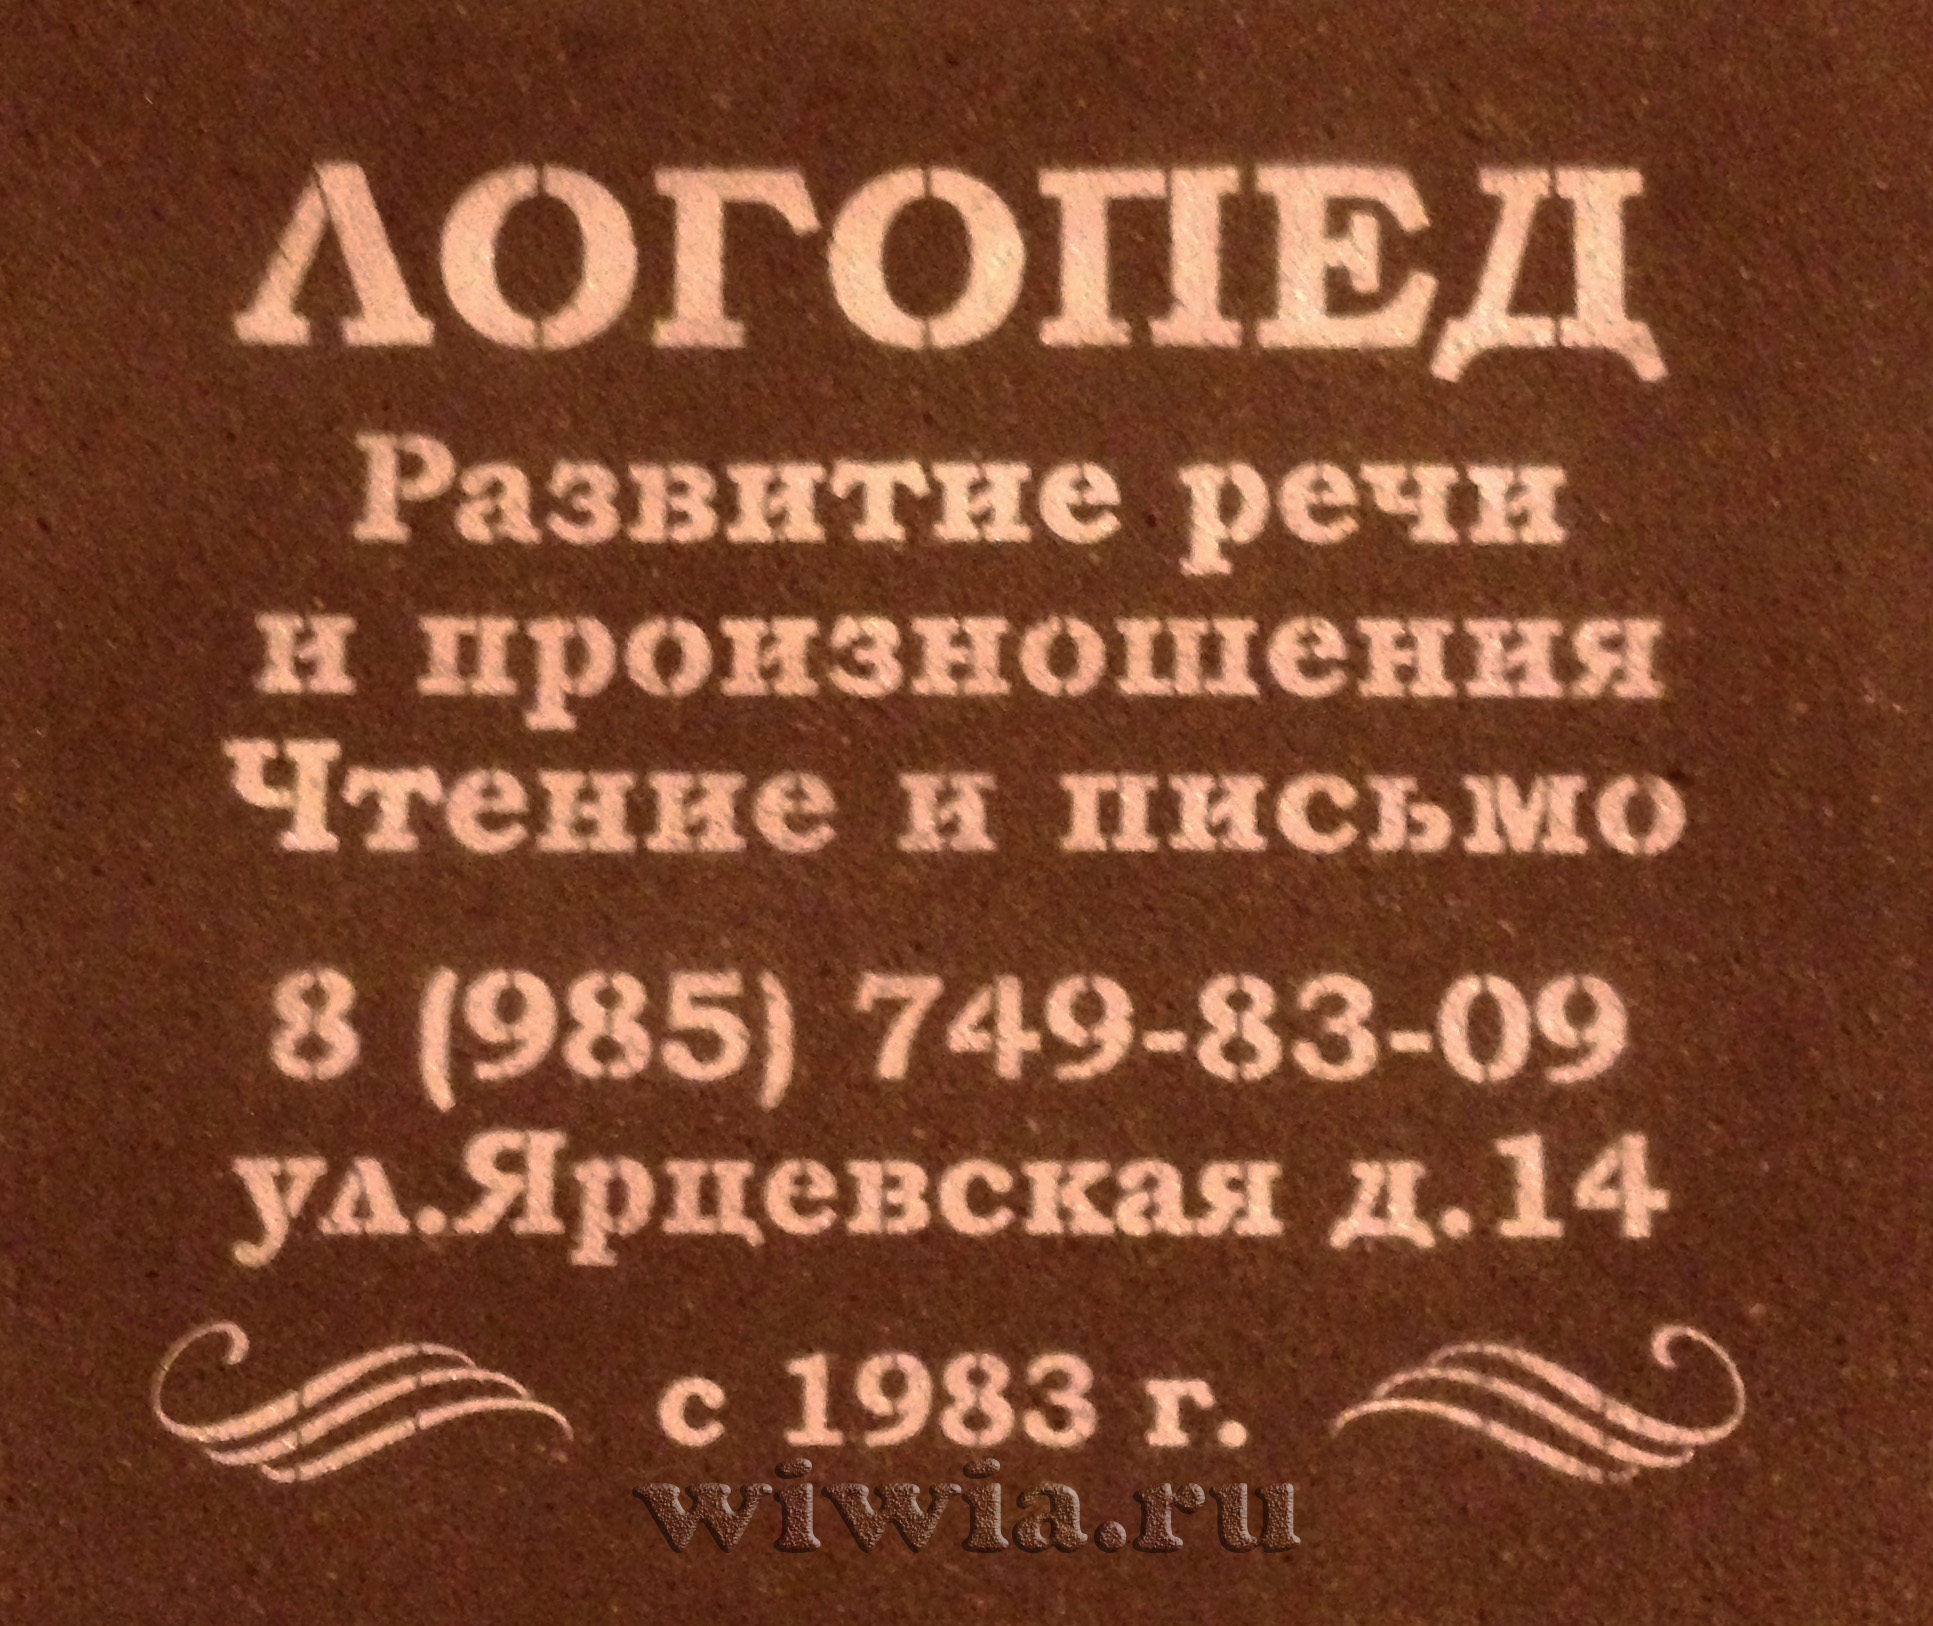 Реклама на асфальте. Логопед.